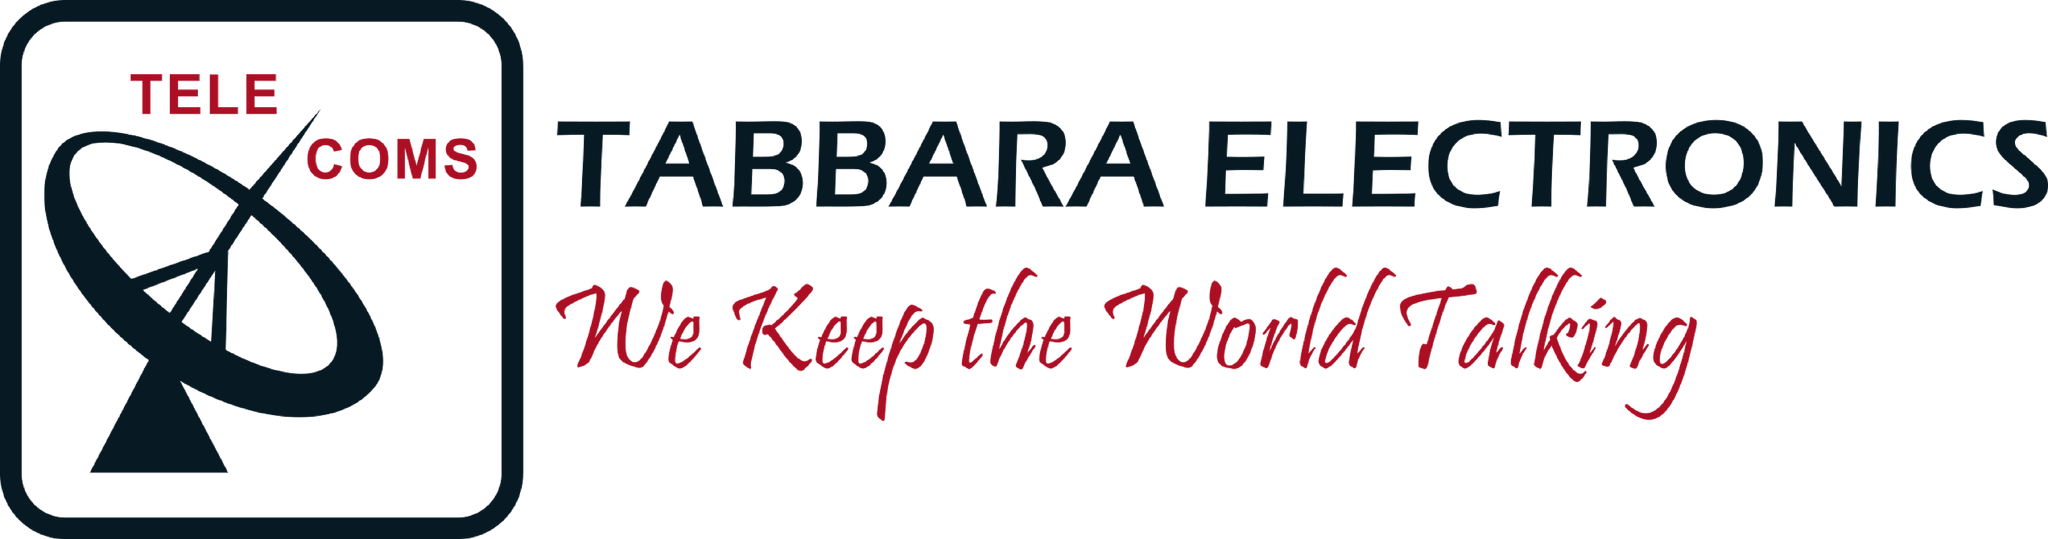 Tabbara Electronics LLC